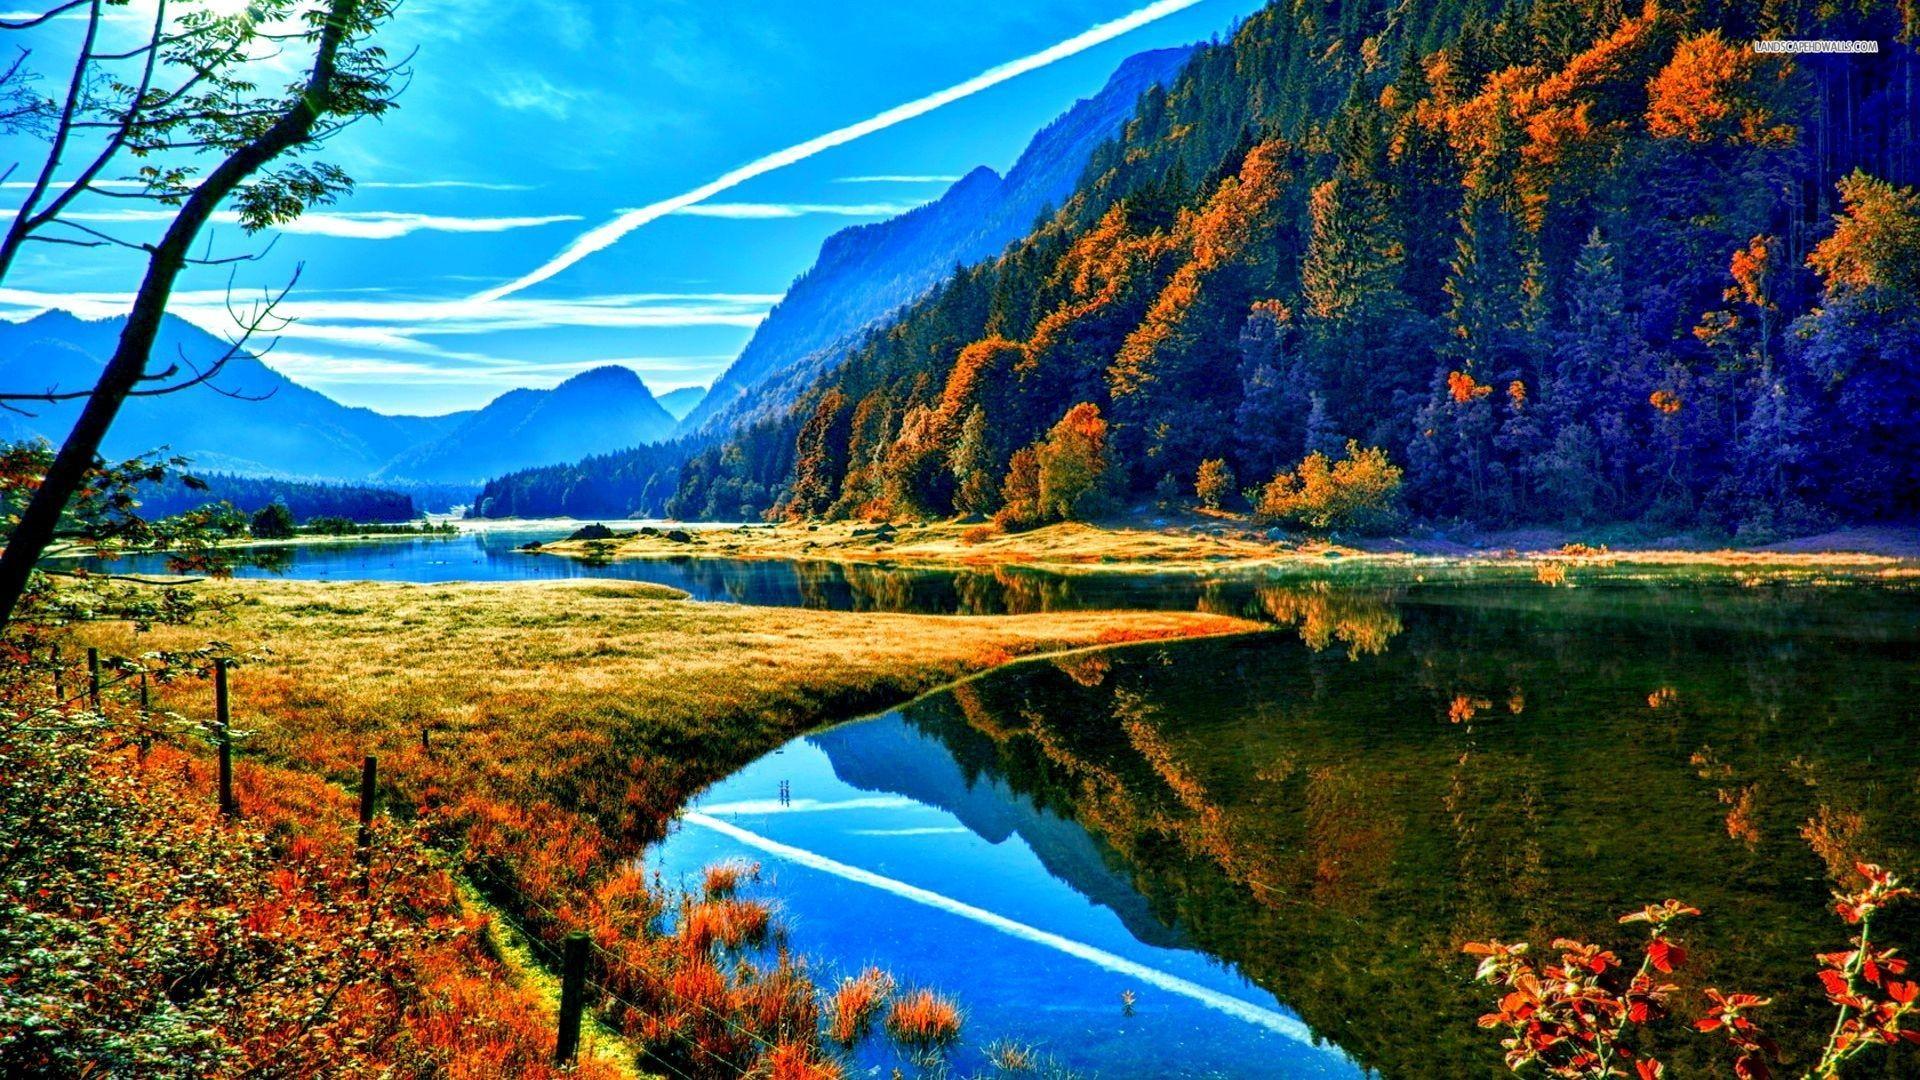 autumn mountains backgrounds. 2560x1600 Autumn Mountain Wallpaper Hd Mountains Backgrounds O